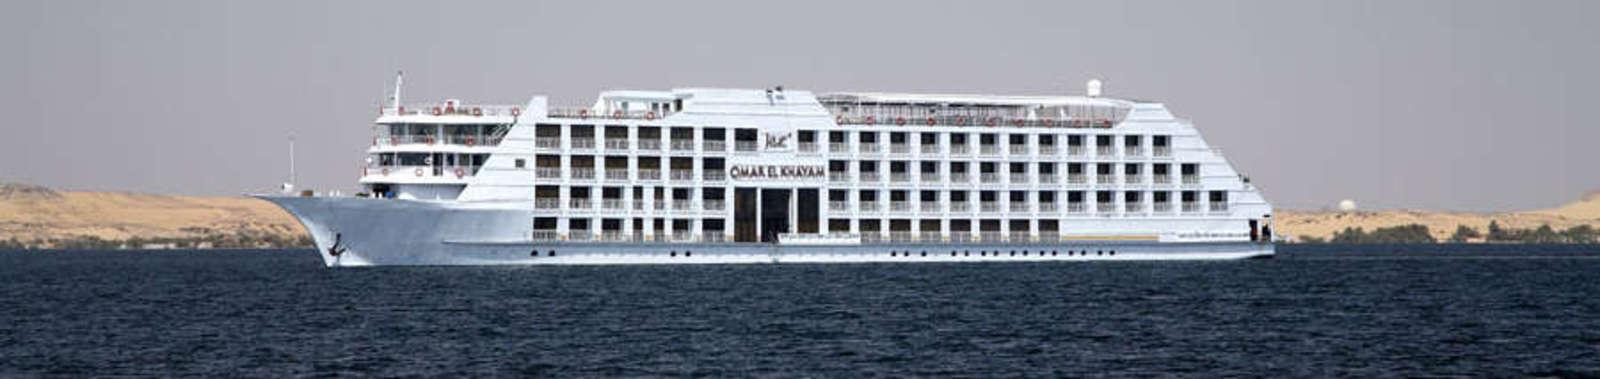 Jaz_Omar_El_Khayam_Lake_Nasser_cruise